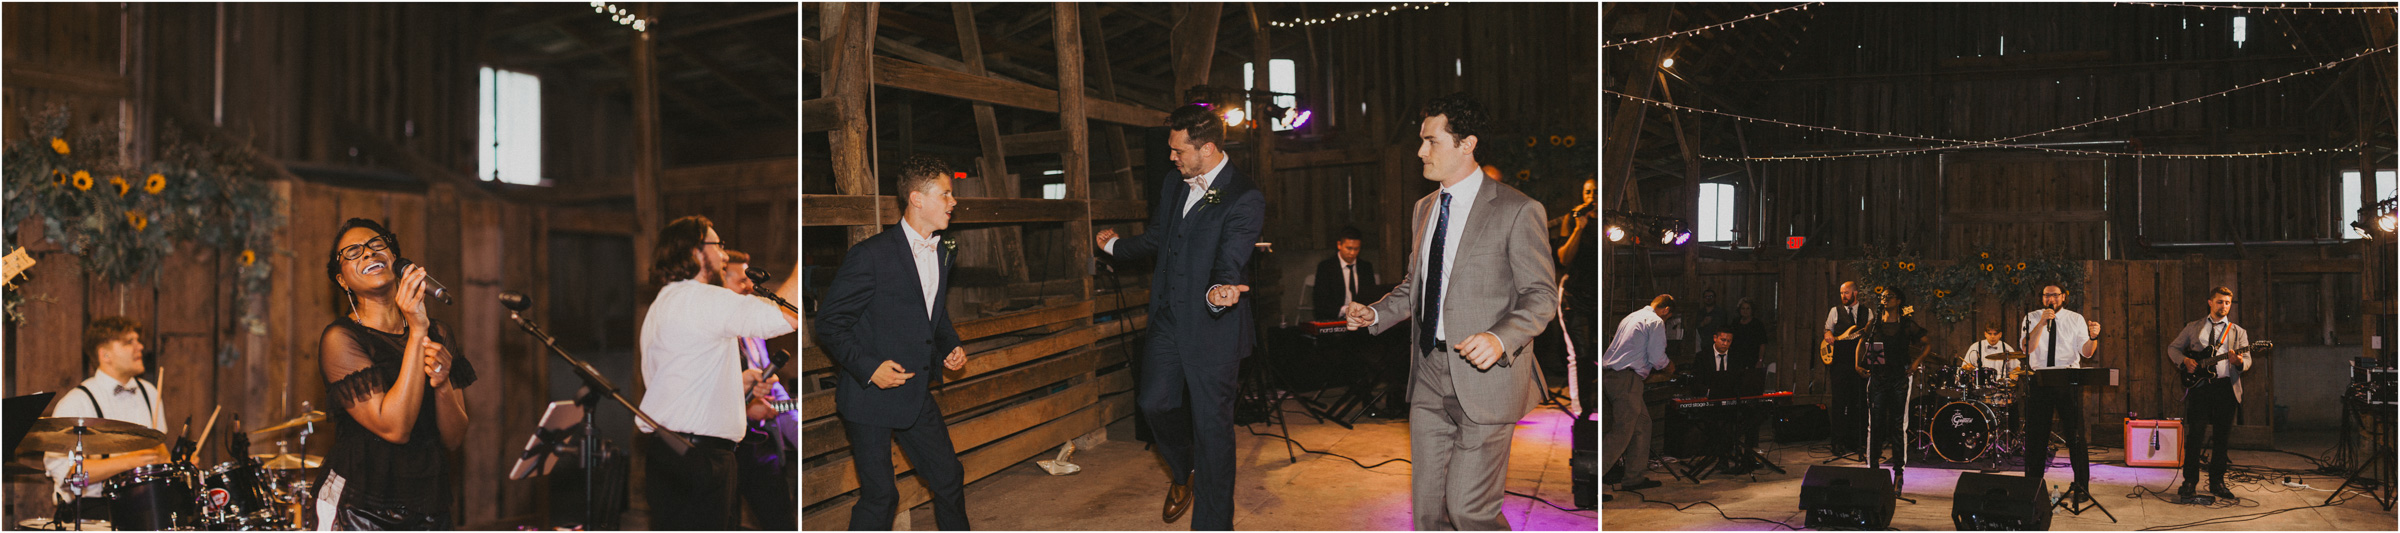 alyssa barletter photography nelson wedding nebraska city lied lodge morton barn spring wedding photographer-61.jpg